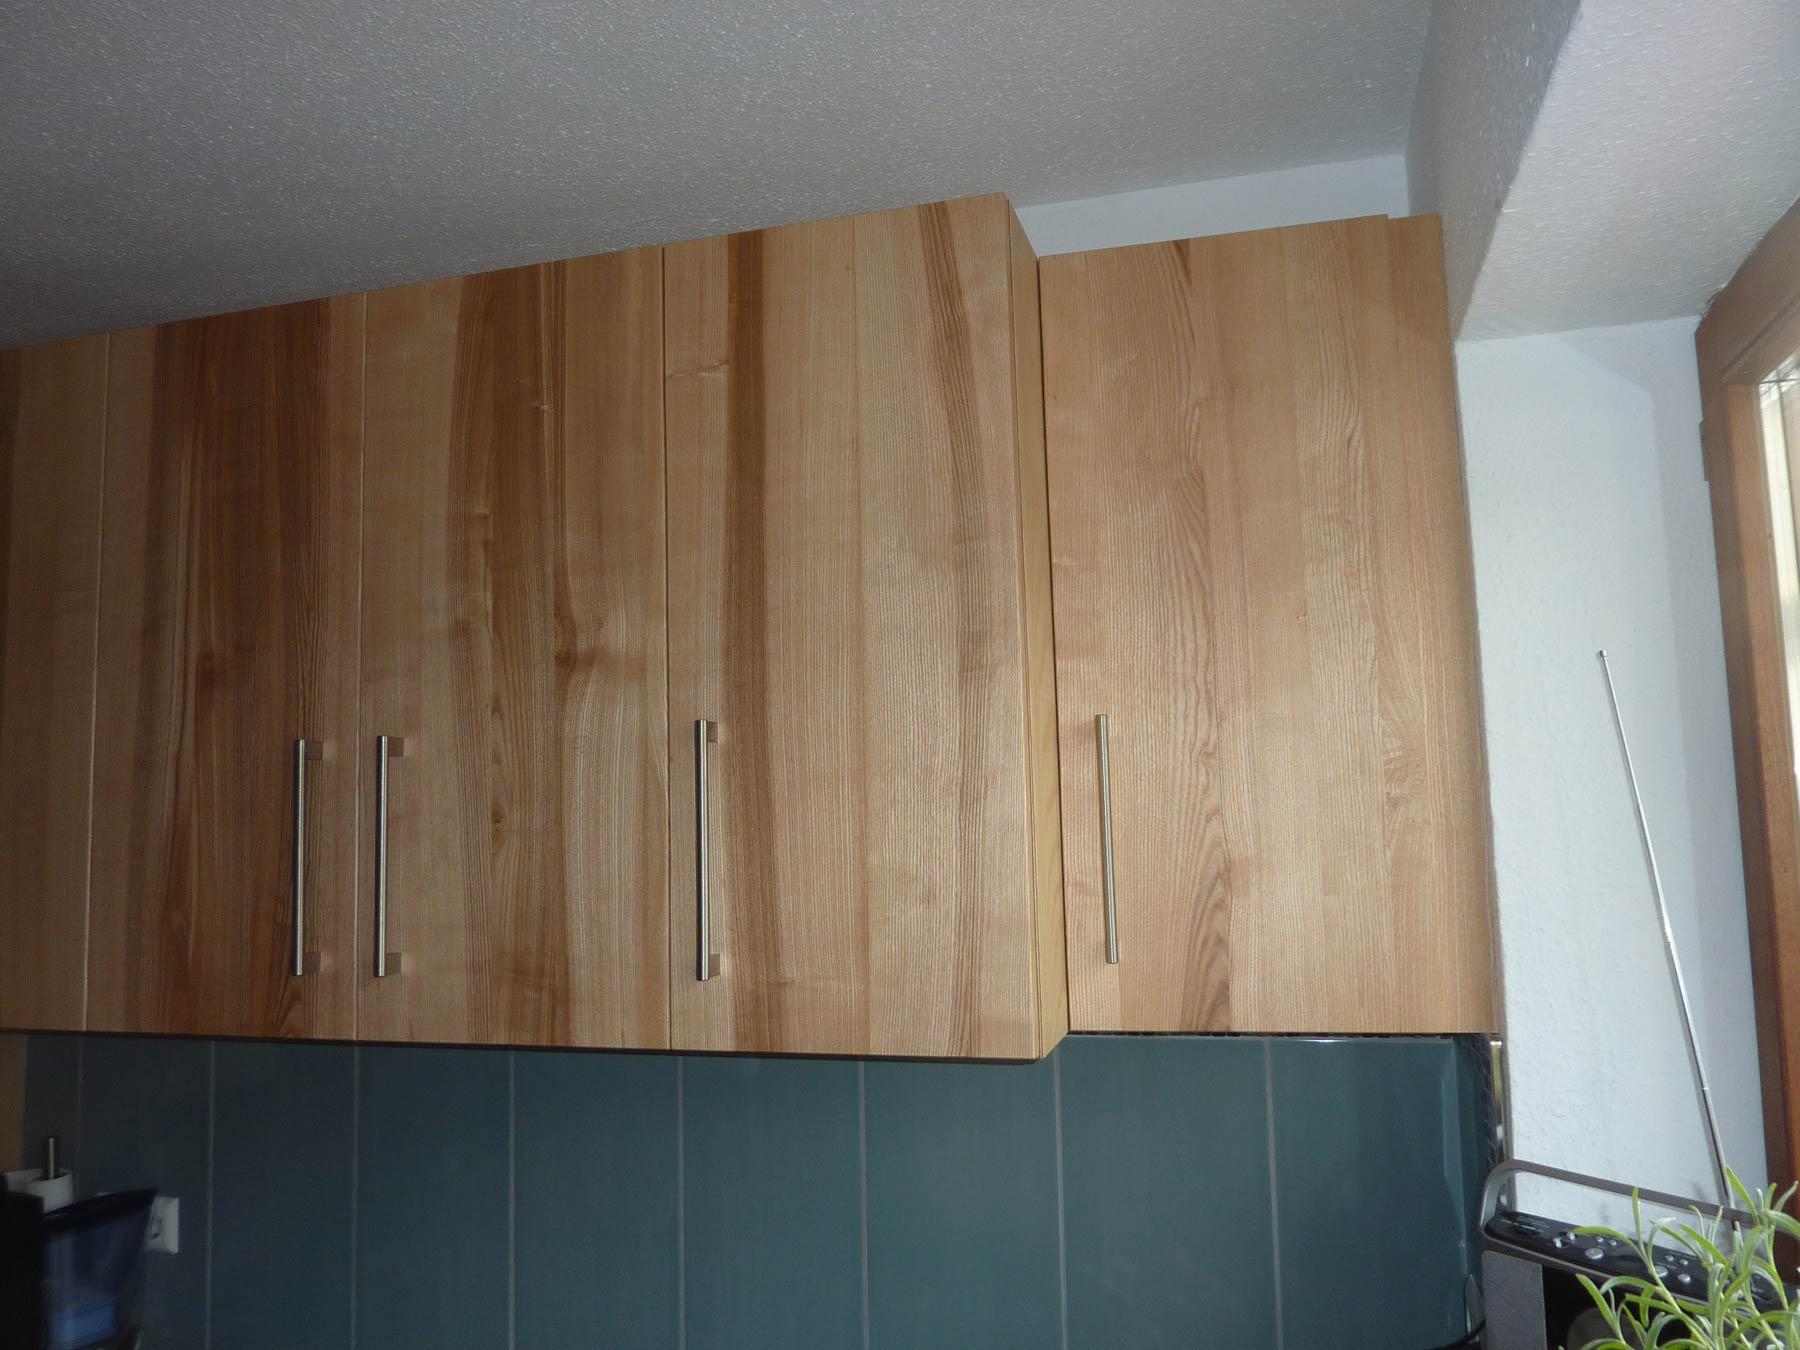 küche in esche massivholz - Esche Küche